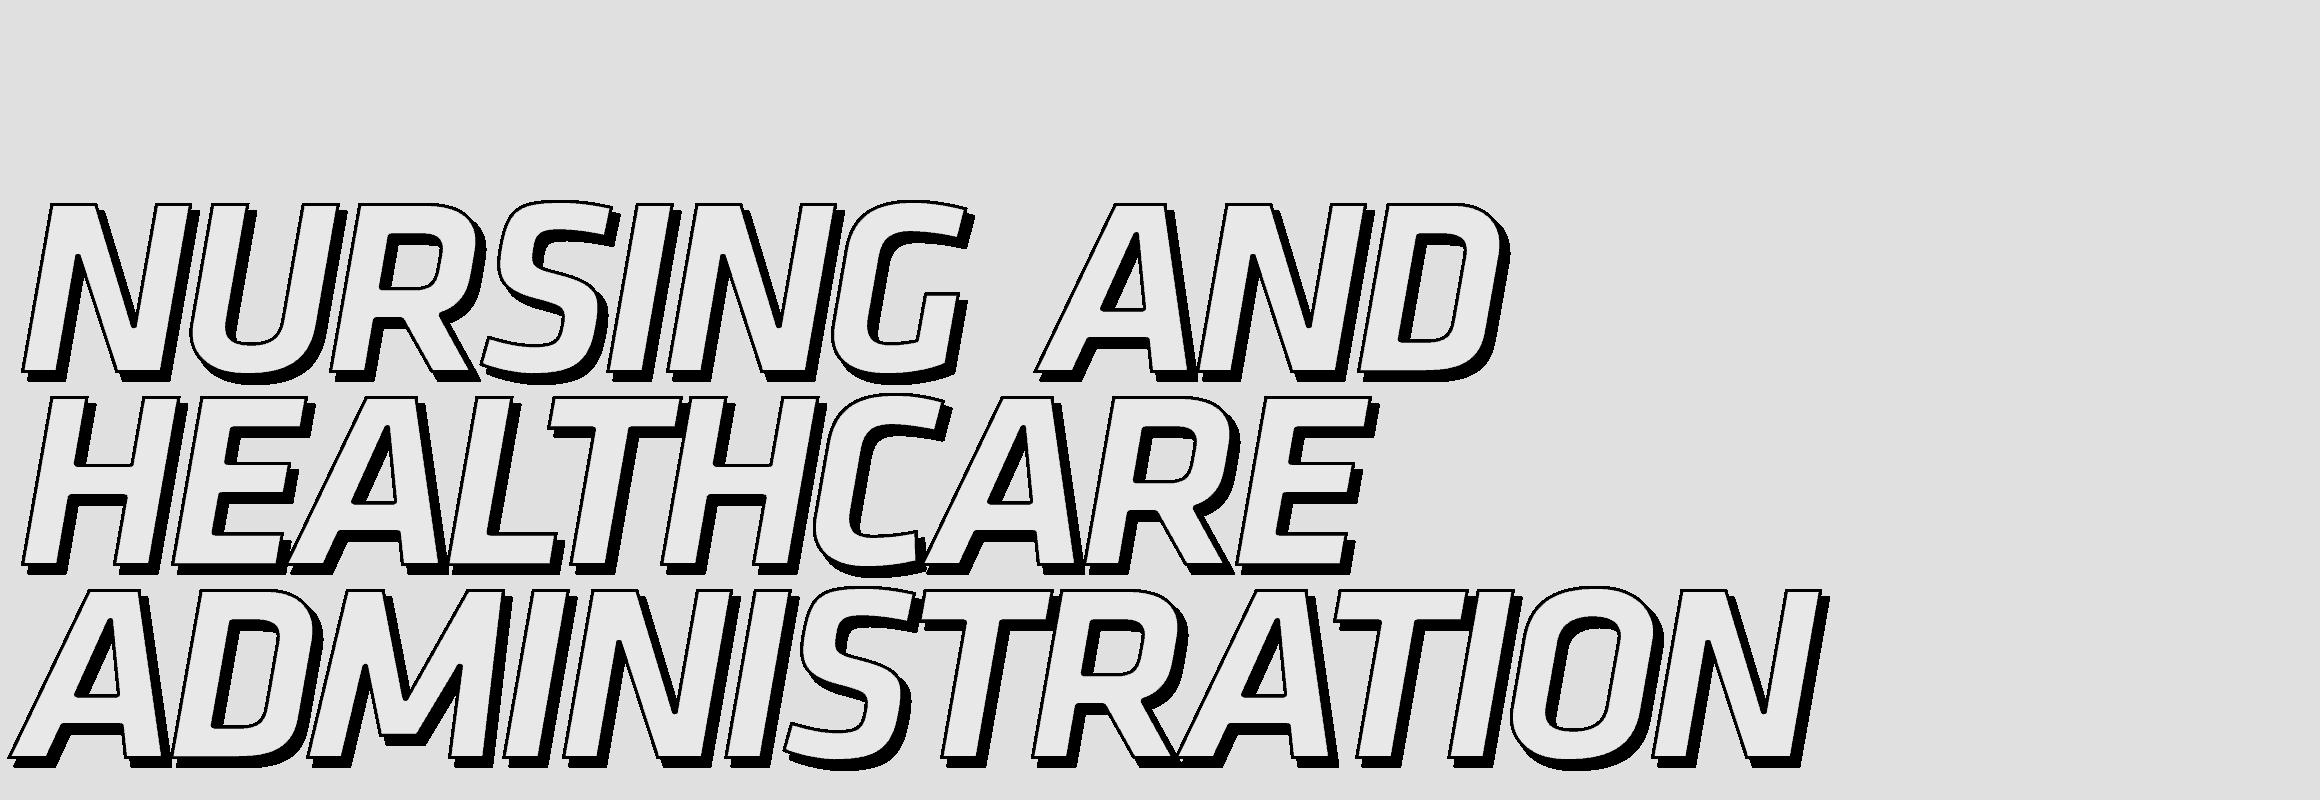 Nursing & Healthcare Administration in Wichita, KS